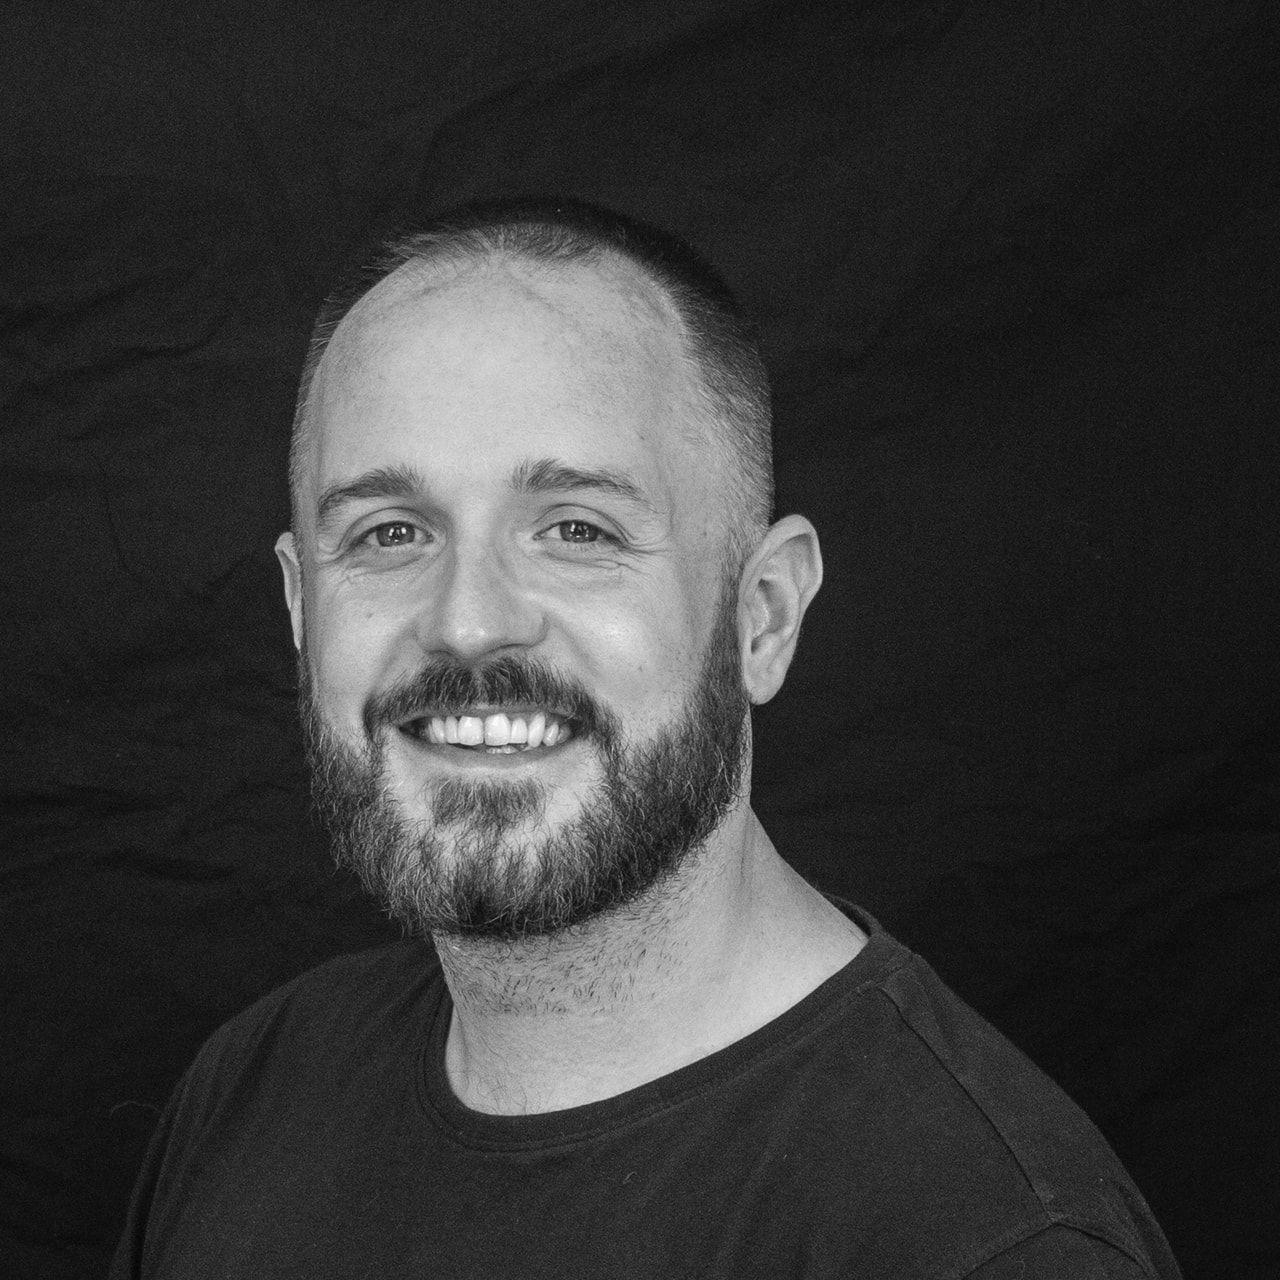 Craig Griffiths